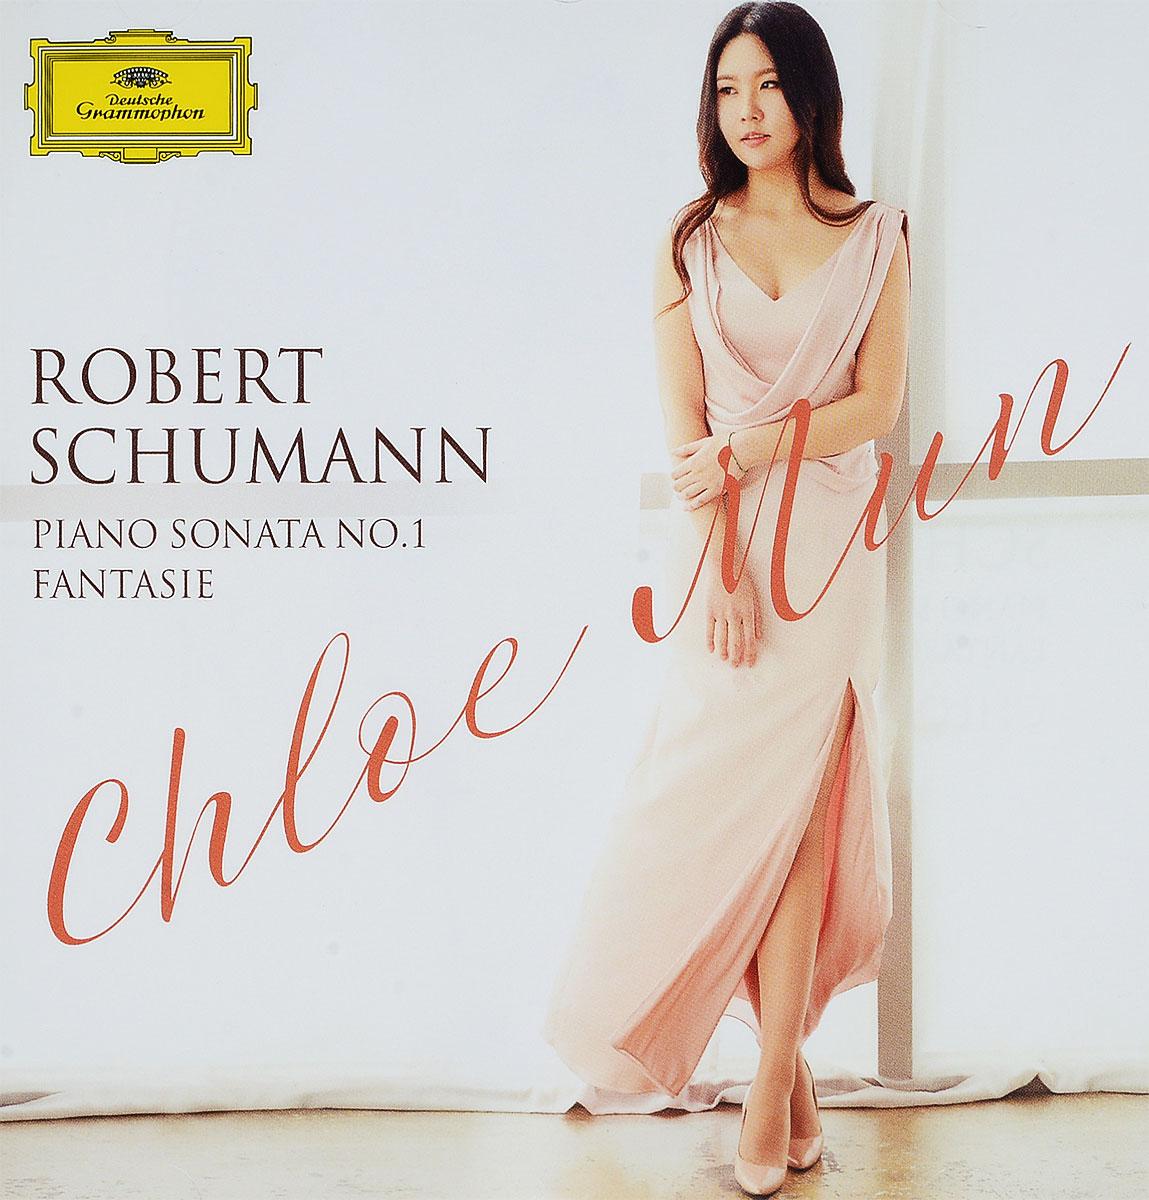 Chloe Mun Chloe Mun. Schumann: Piano Sonata No.1 & Fantasie johnathan mun valuing employee stock options